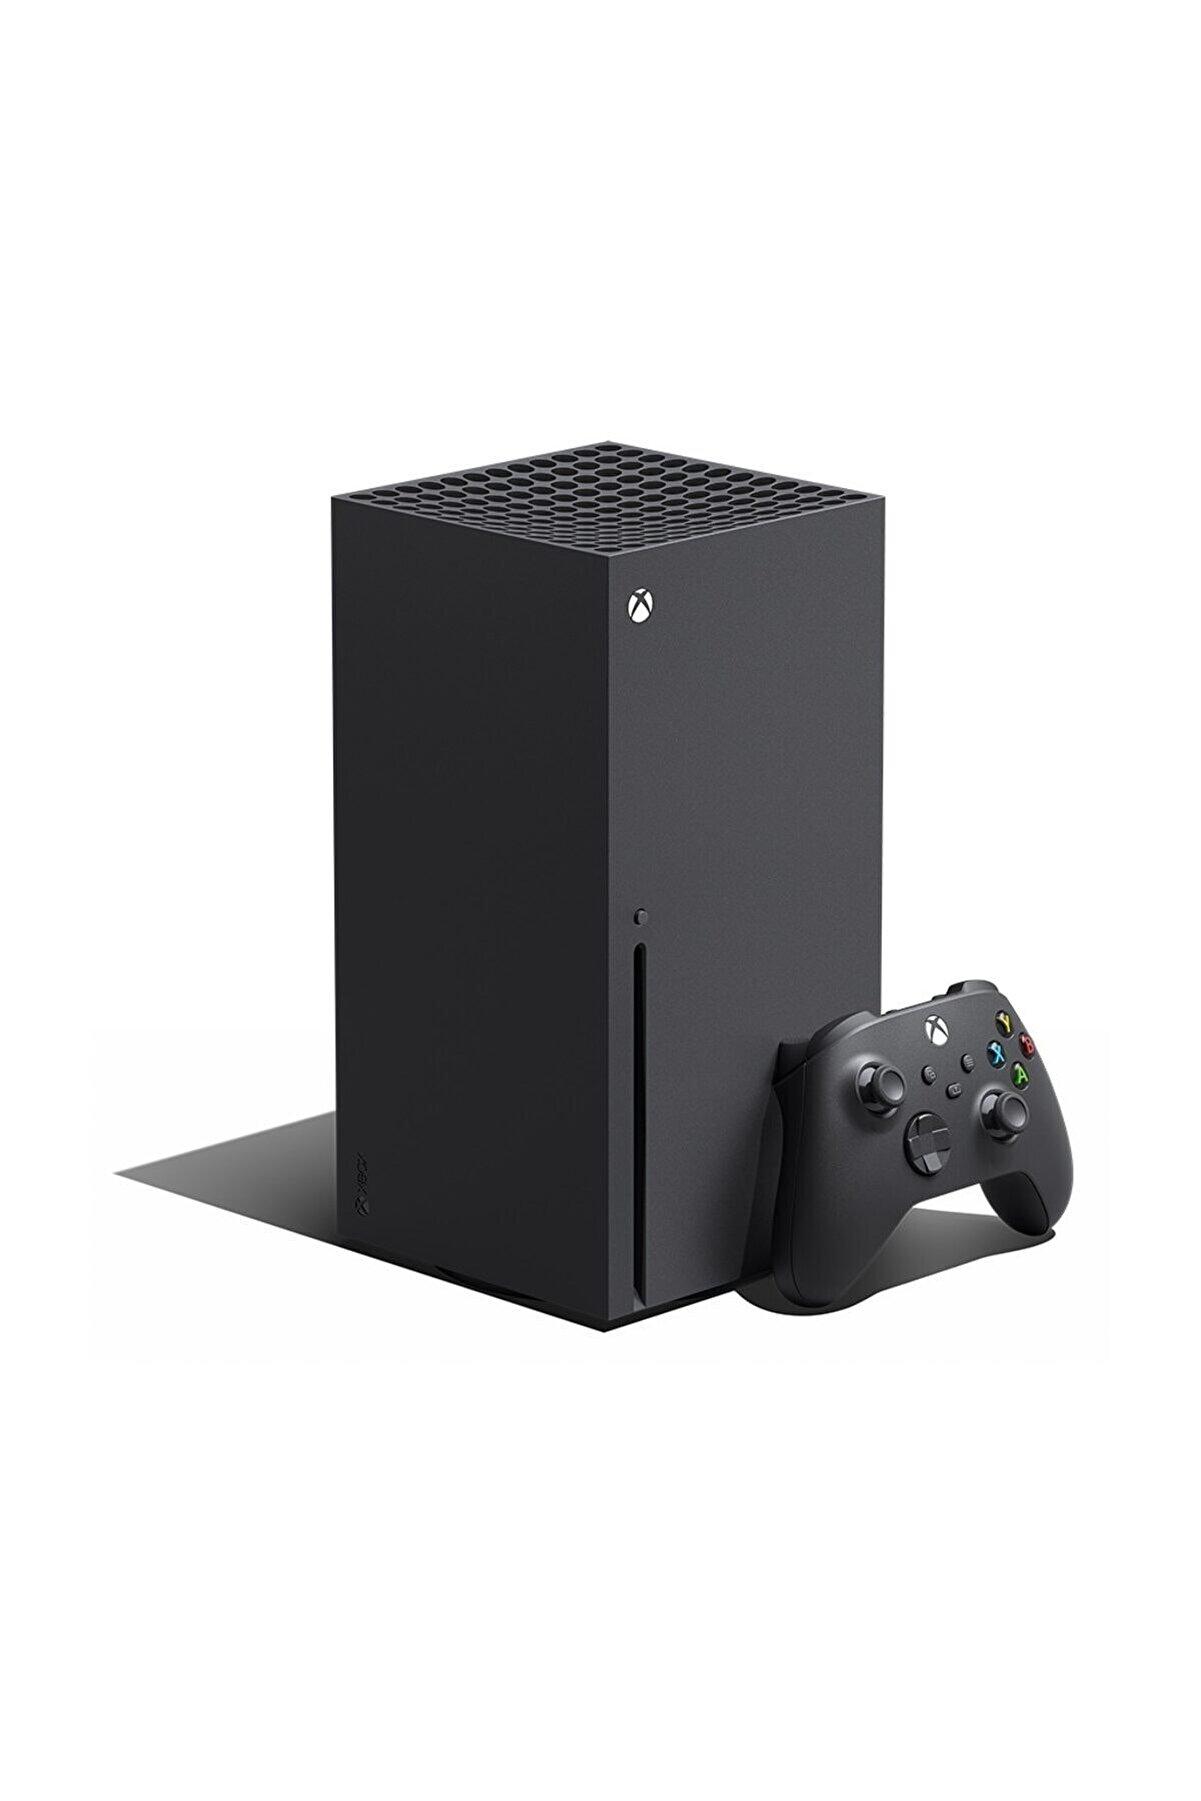 Microsoft Xbox Series X 1 TB Oyun Konsolu - Siyah (Microsoft TR Garantili)